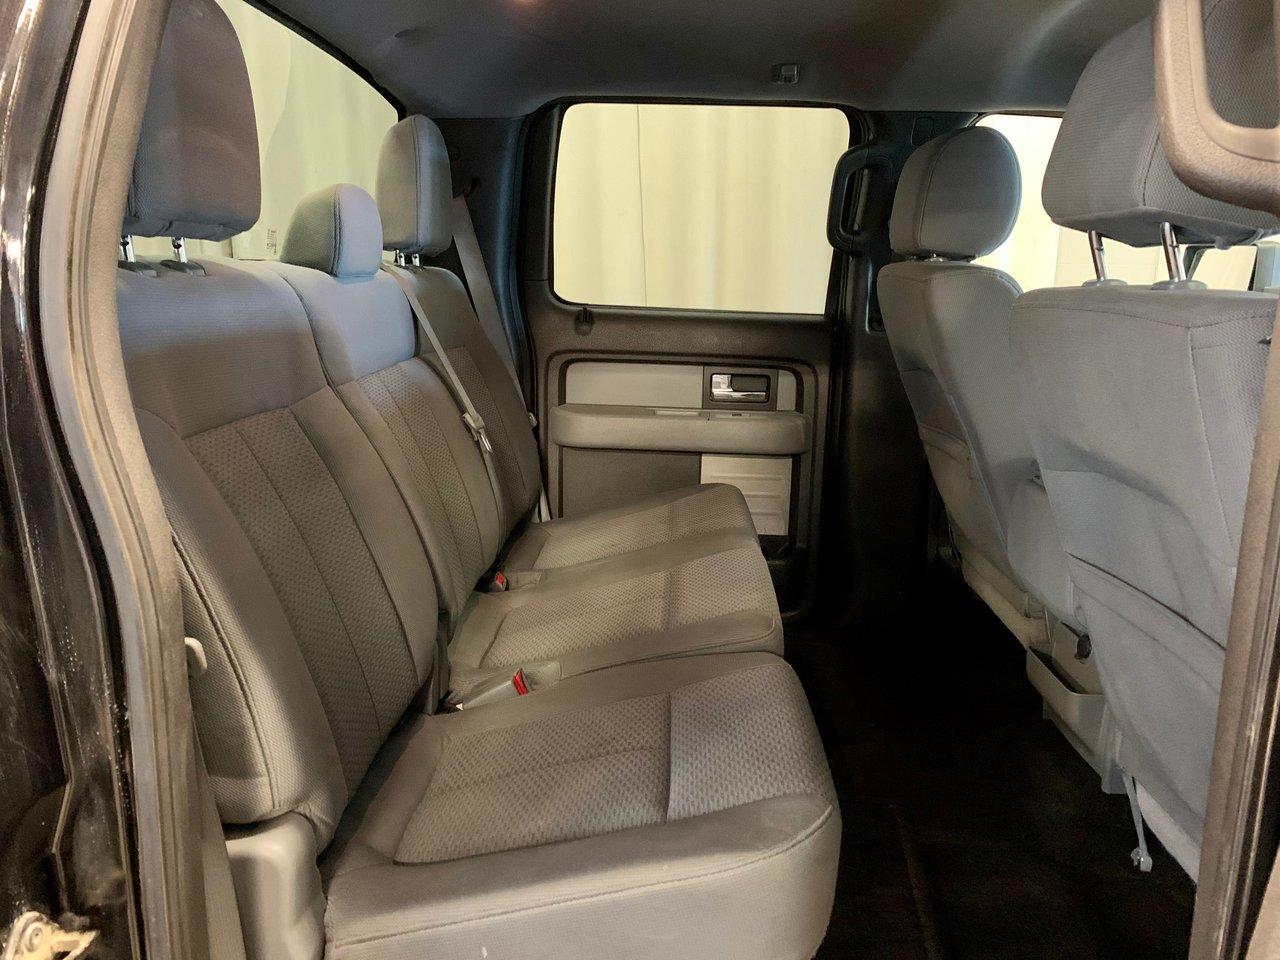 2014 Ford F-150 XLT 302A 4X4 / JAMAIS ACCIDENTEE